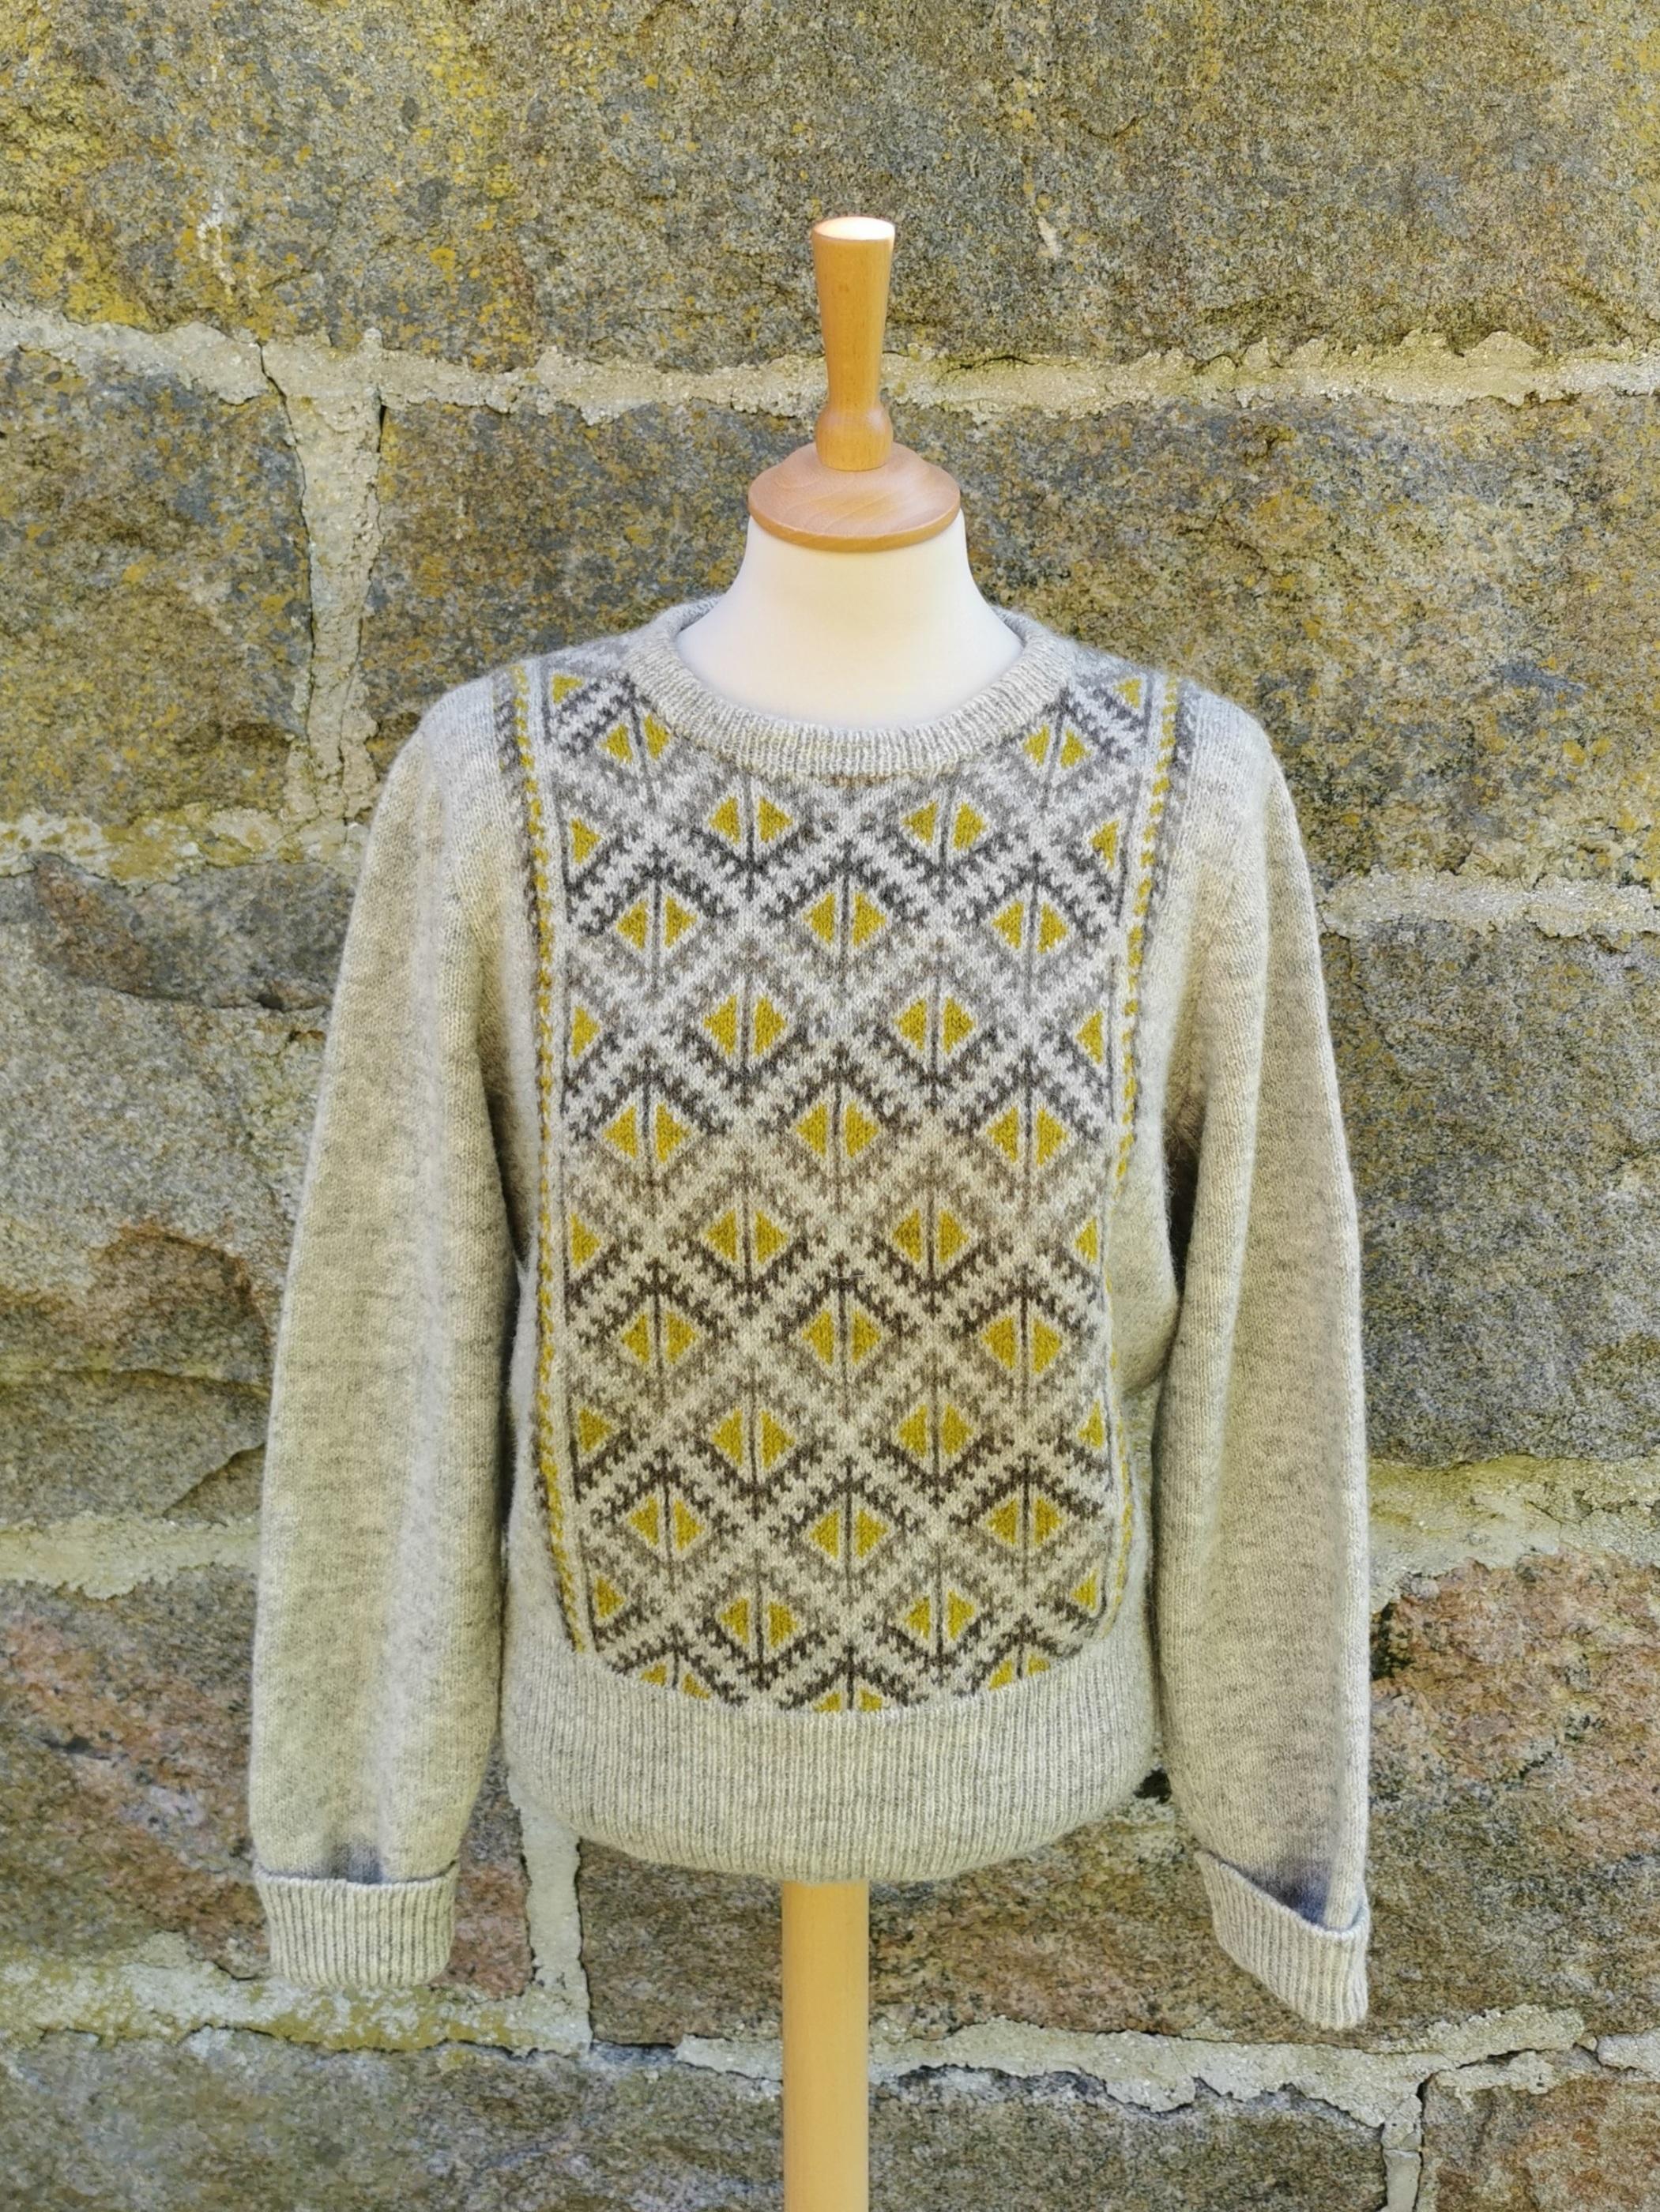 Bohus Stickning Persern the Persian pullover kit